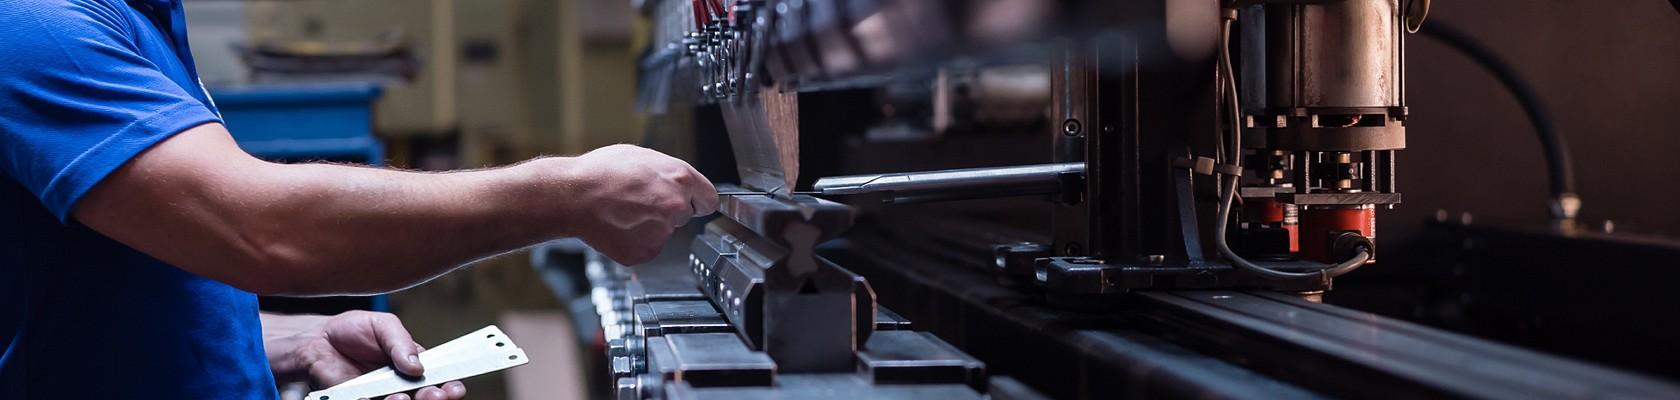 person using manufacturing machine